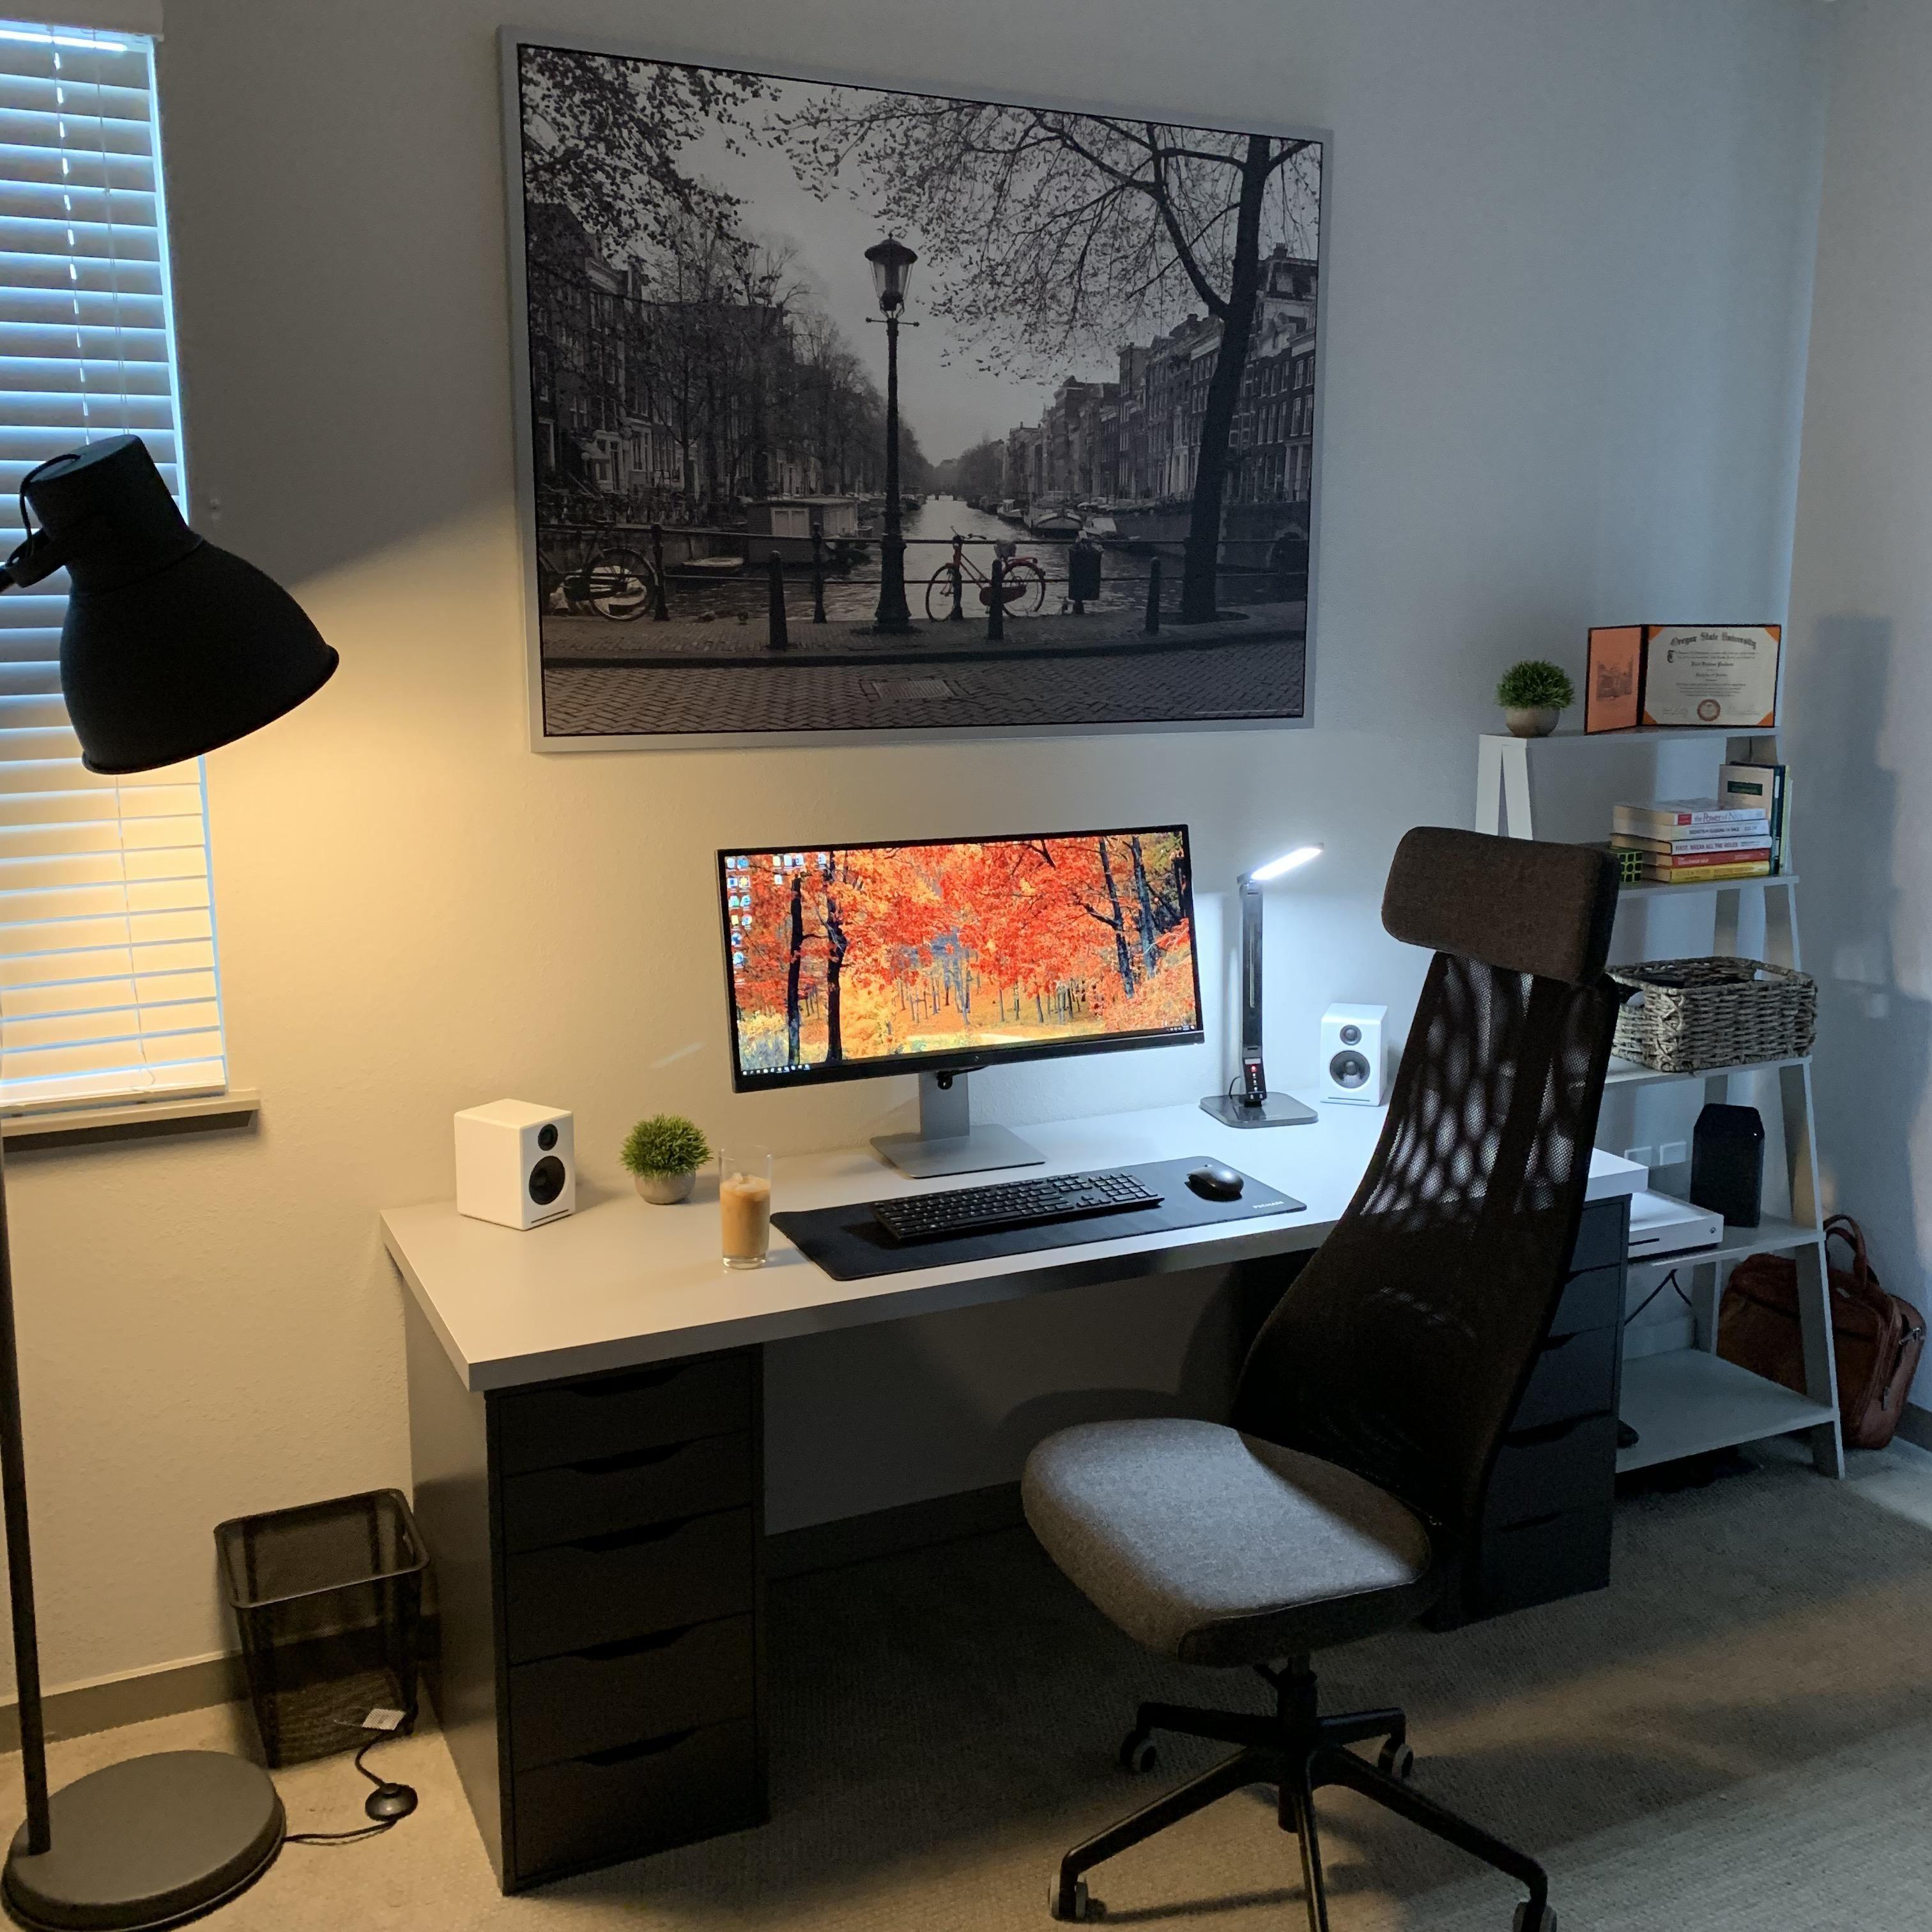 Картинки комнат с компьютером